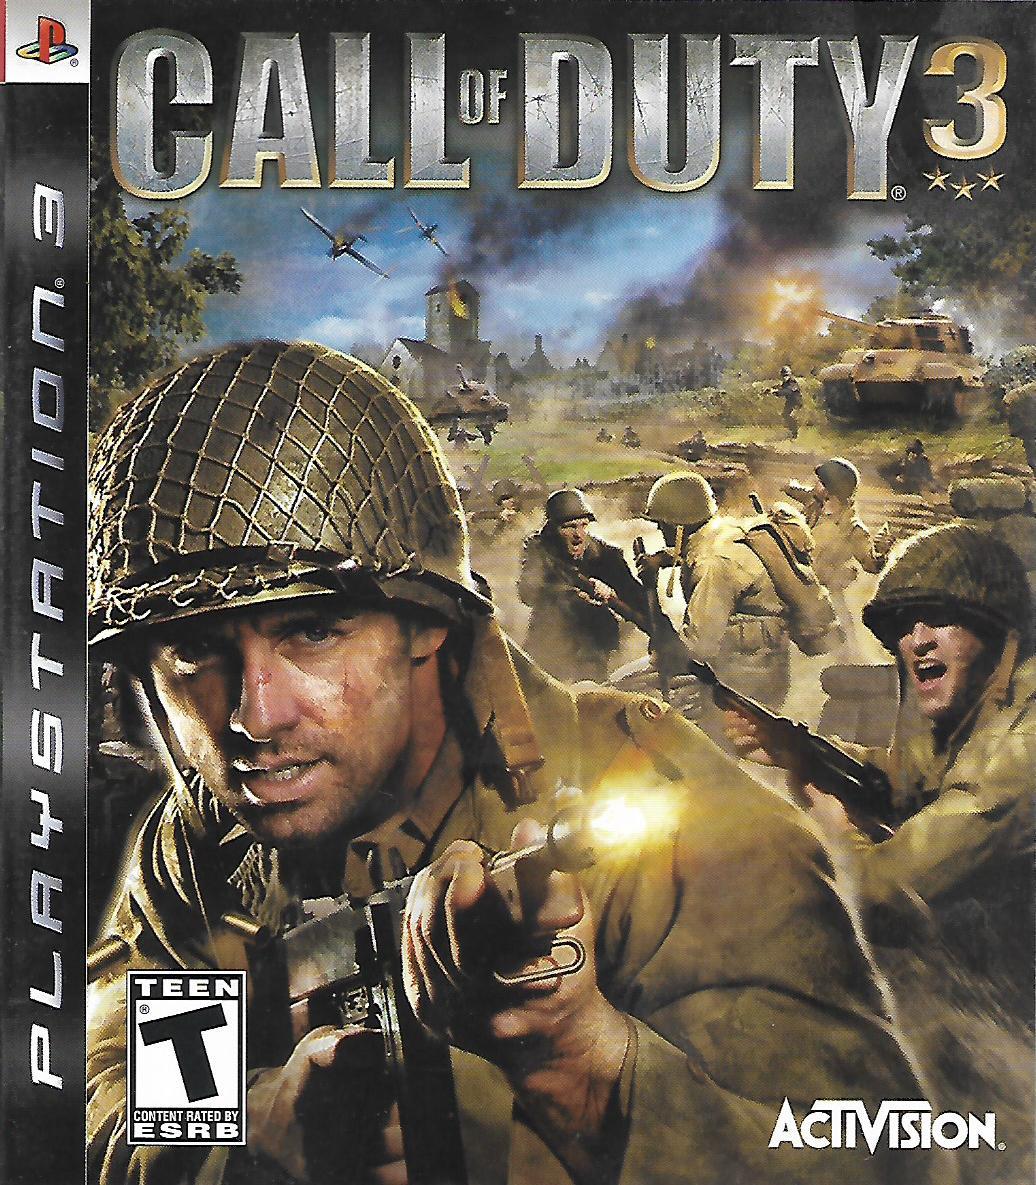 CALL OF DUTY 3 (PS3 - bazar)